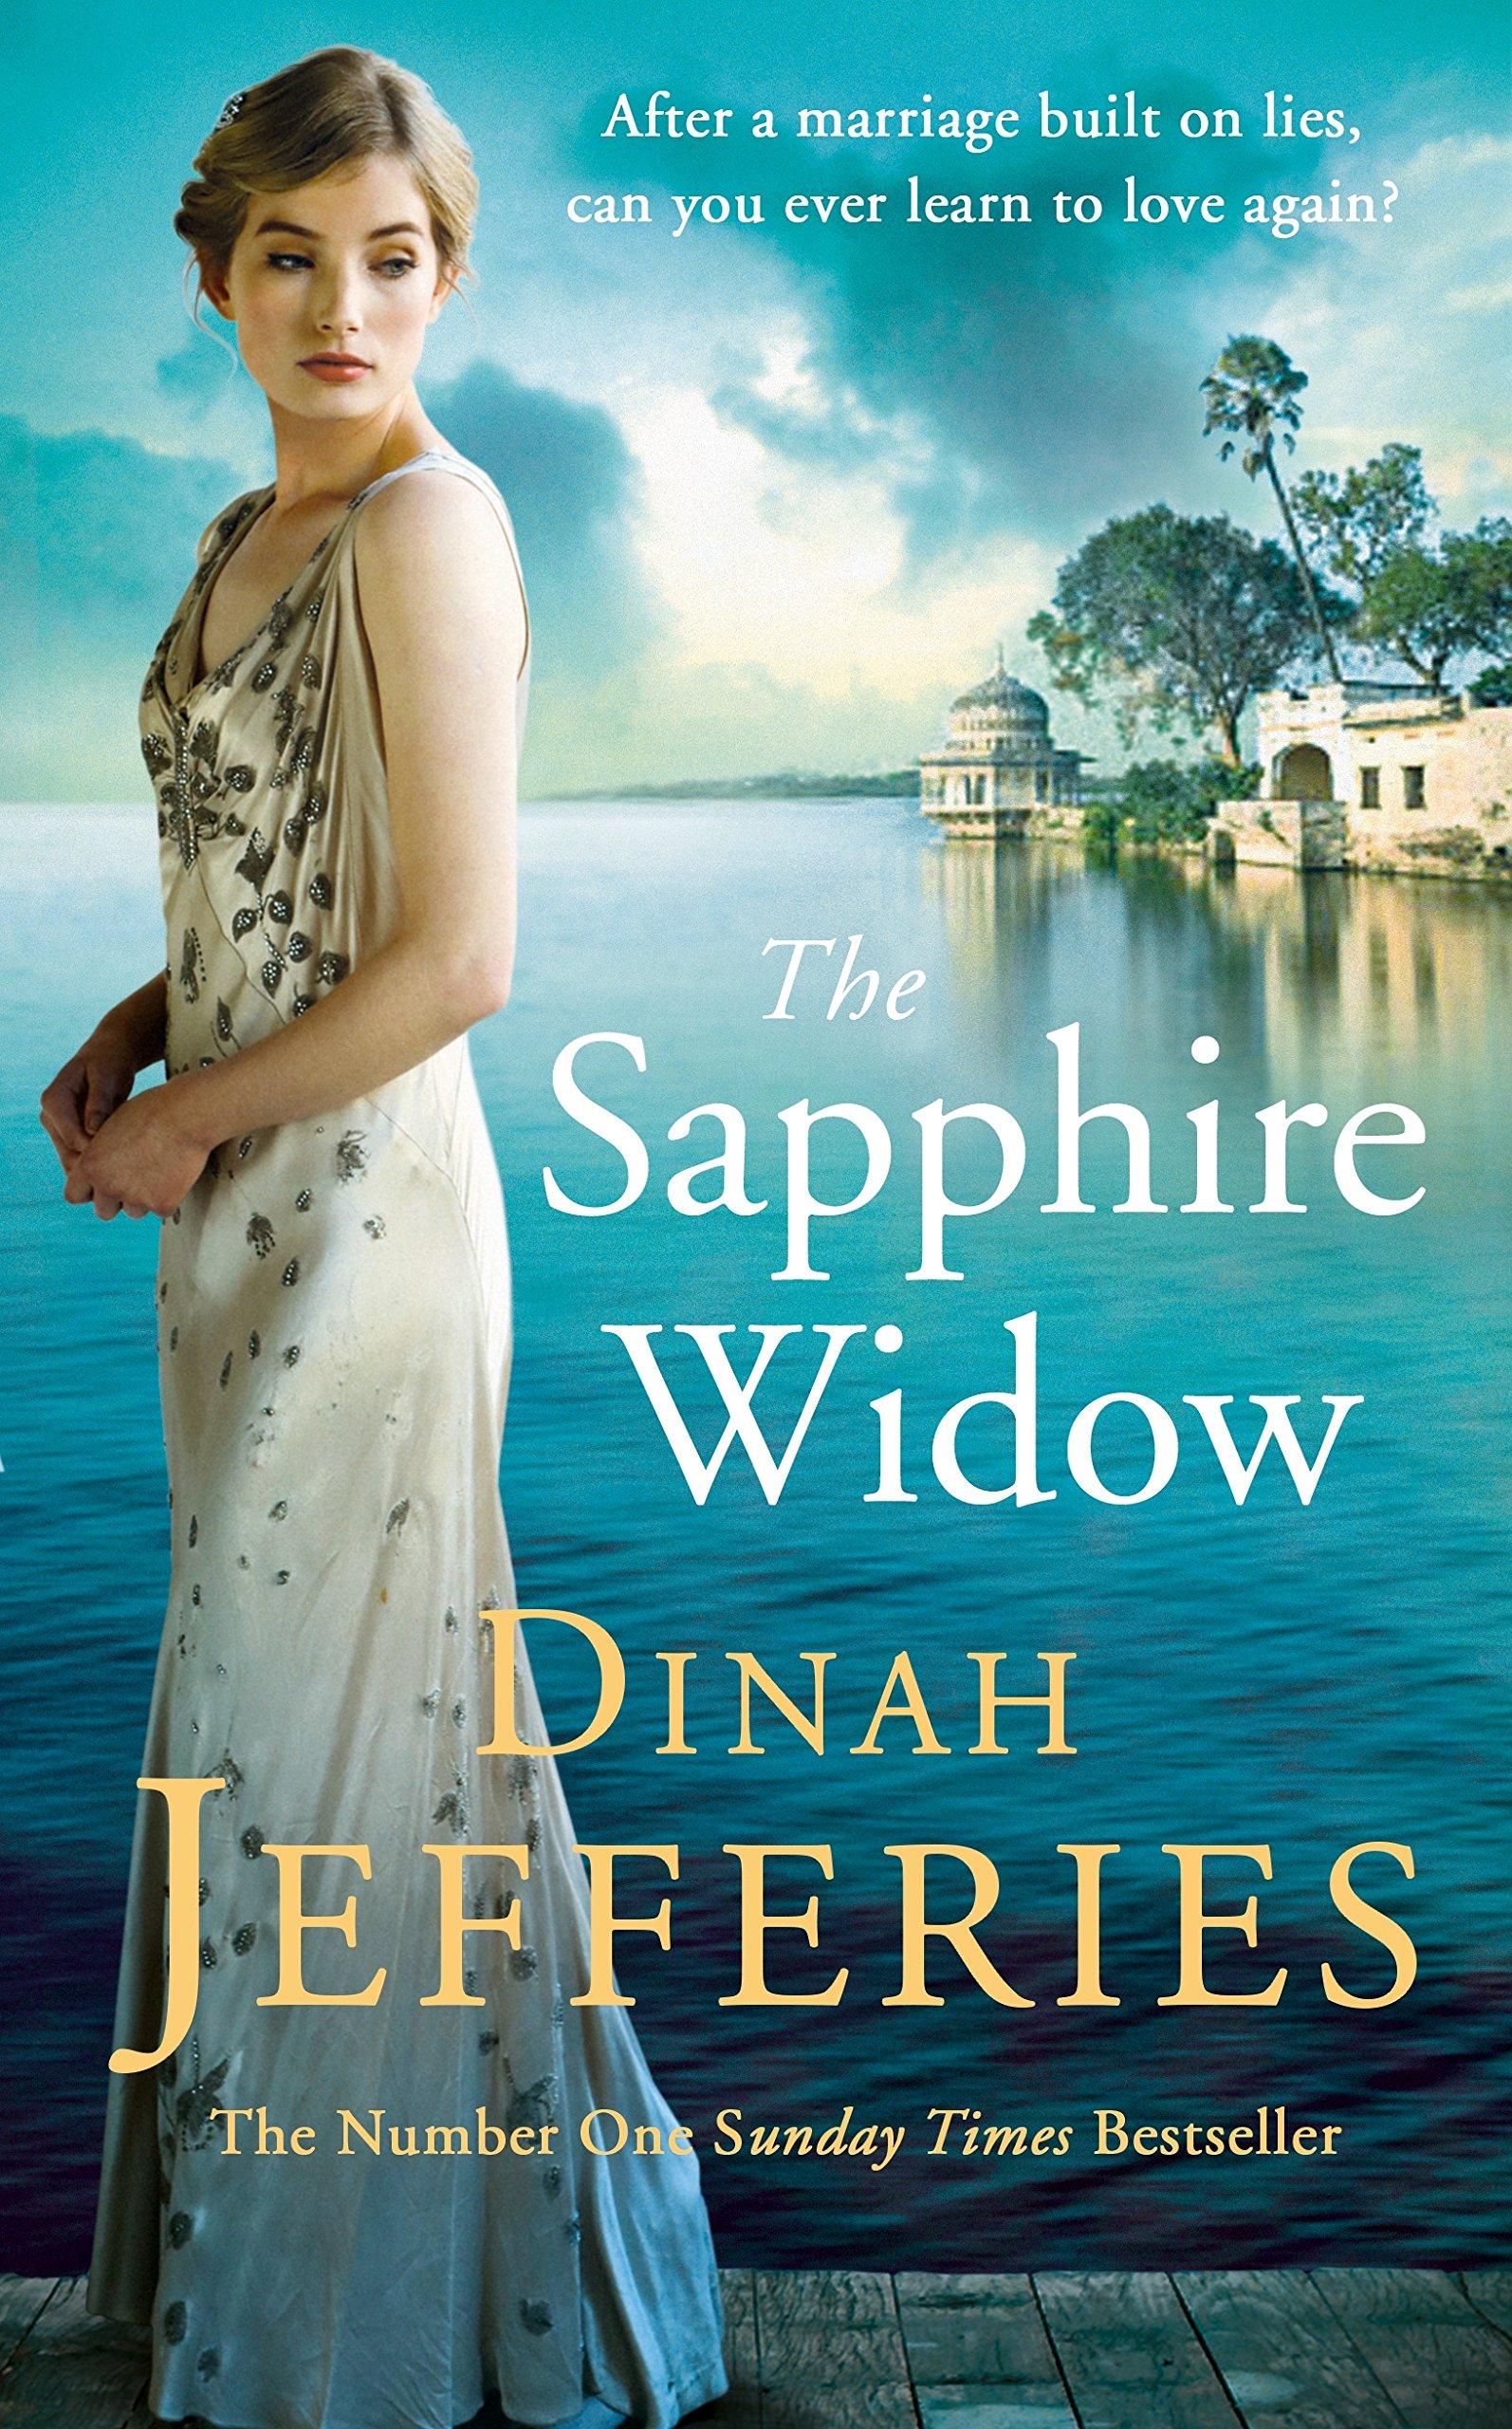 The Sapphire Widow: The Enchanting Richard & Judy Book Club Pick 2018:  Amazon.co.uk: Dinah Jefferies: 9780241303764: Books